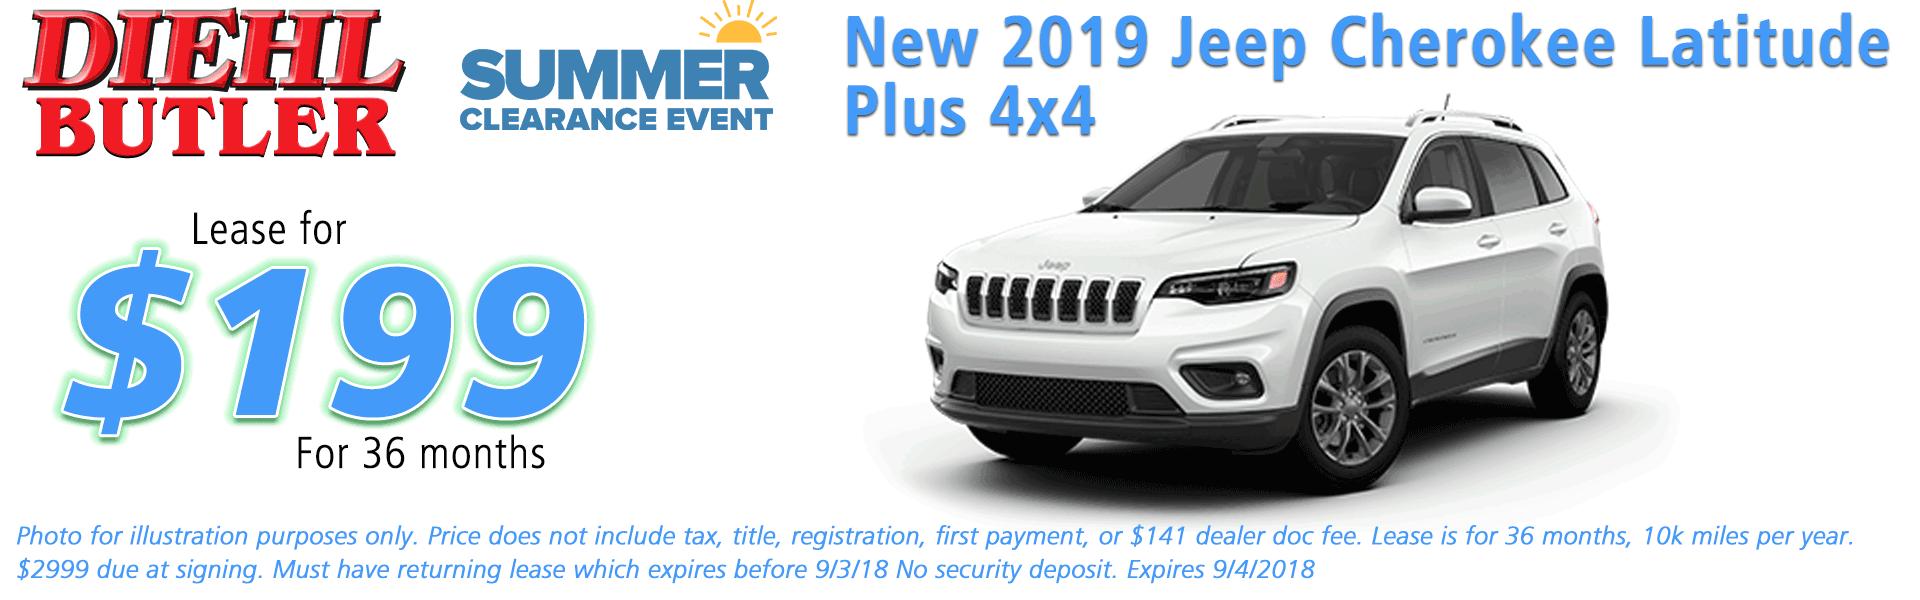 Diehl of Butler, Butler, PA Chrysler Dodge Jeep Ram Toyota Volkswagen service collision sales NEW 2019 JEEP CHEROKEE LATITUDE PLUS 4X4